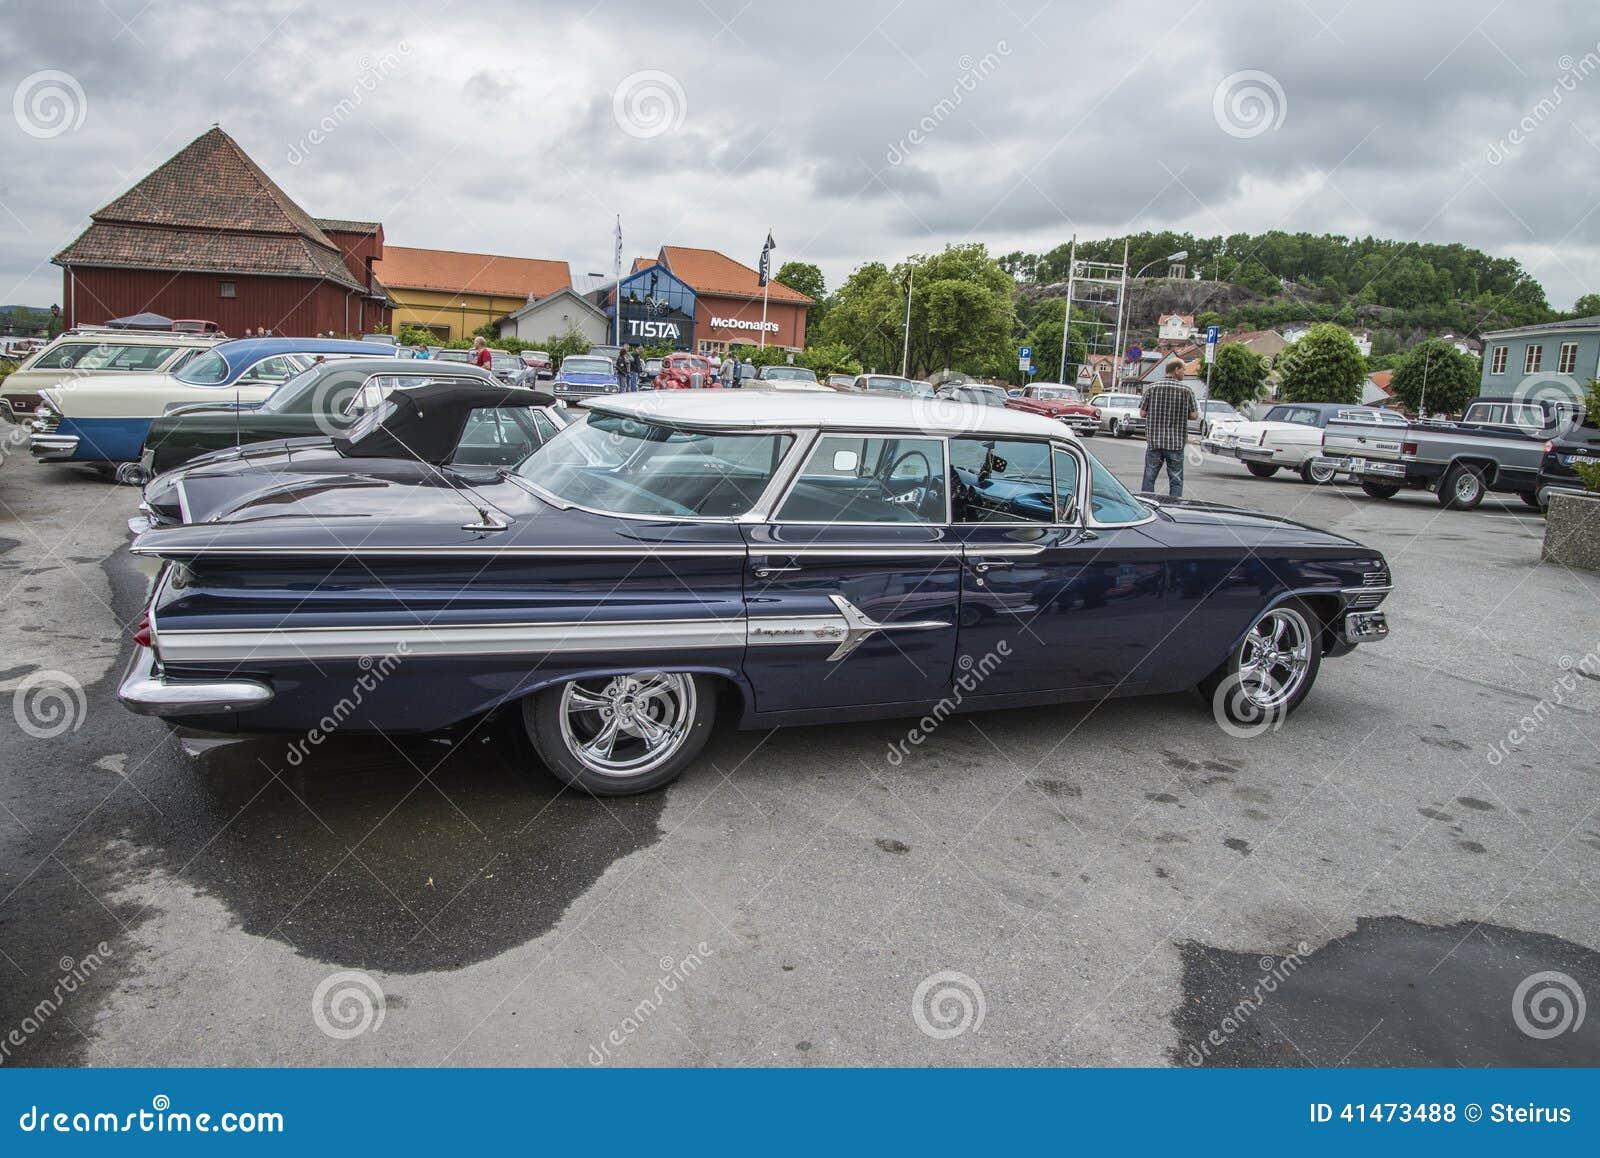 1960 Chevrolet Impala 4 Door Hardtop Sedan Editorial Stock Photo